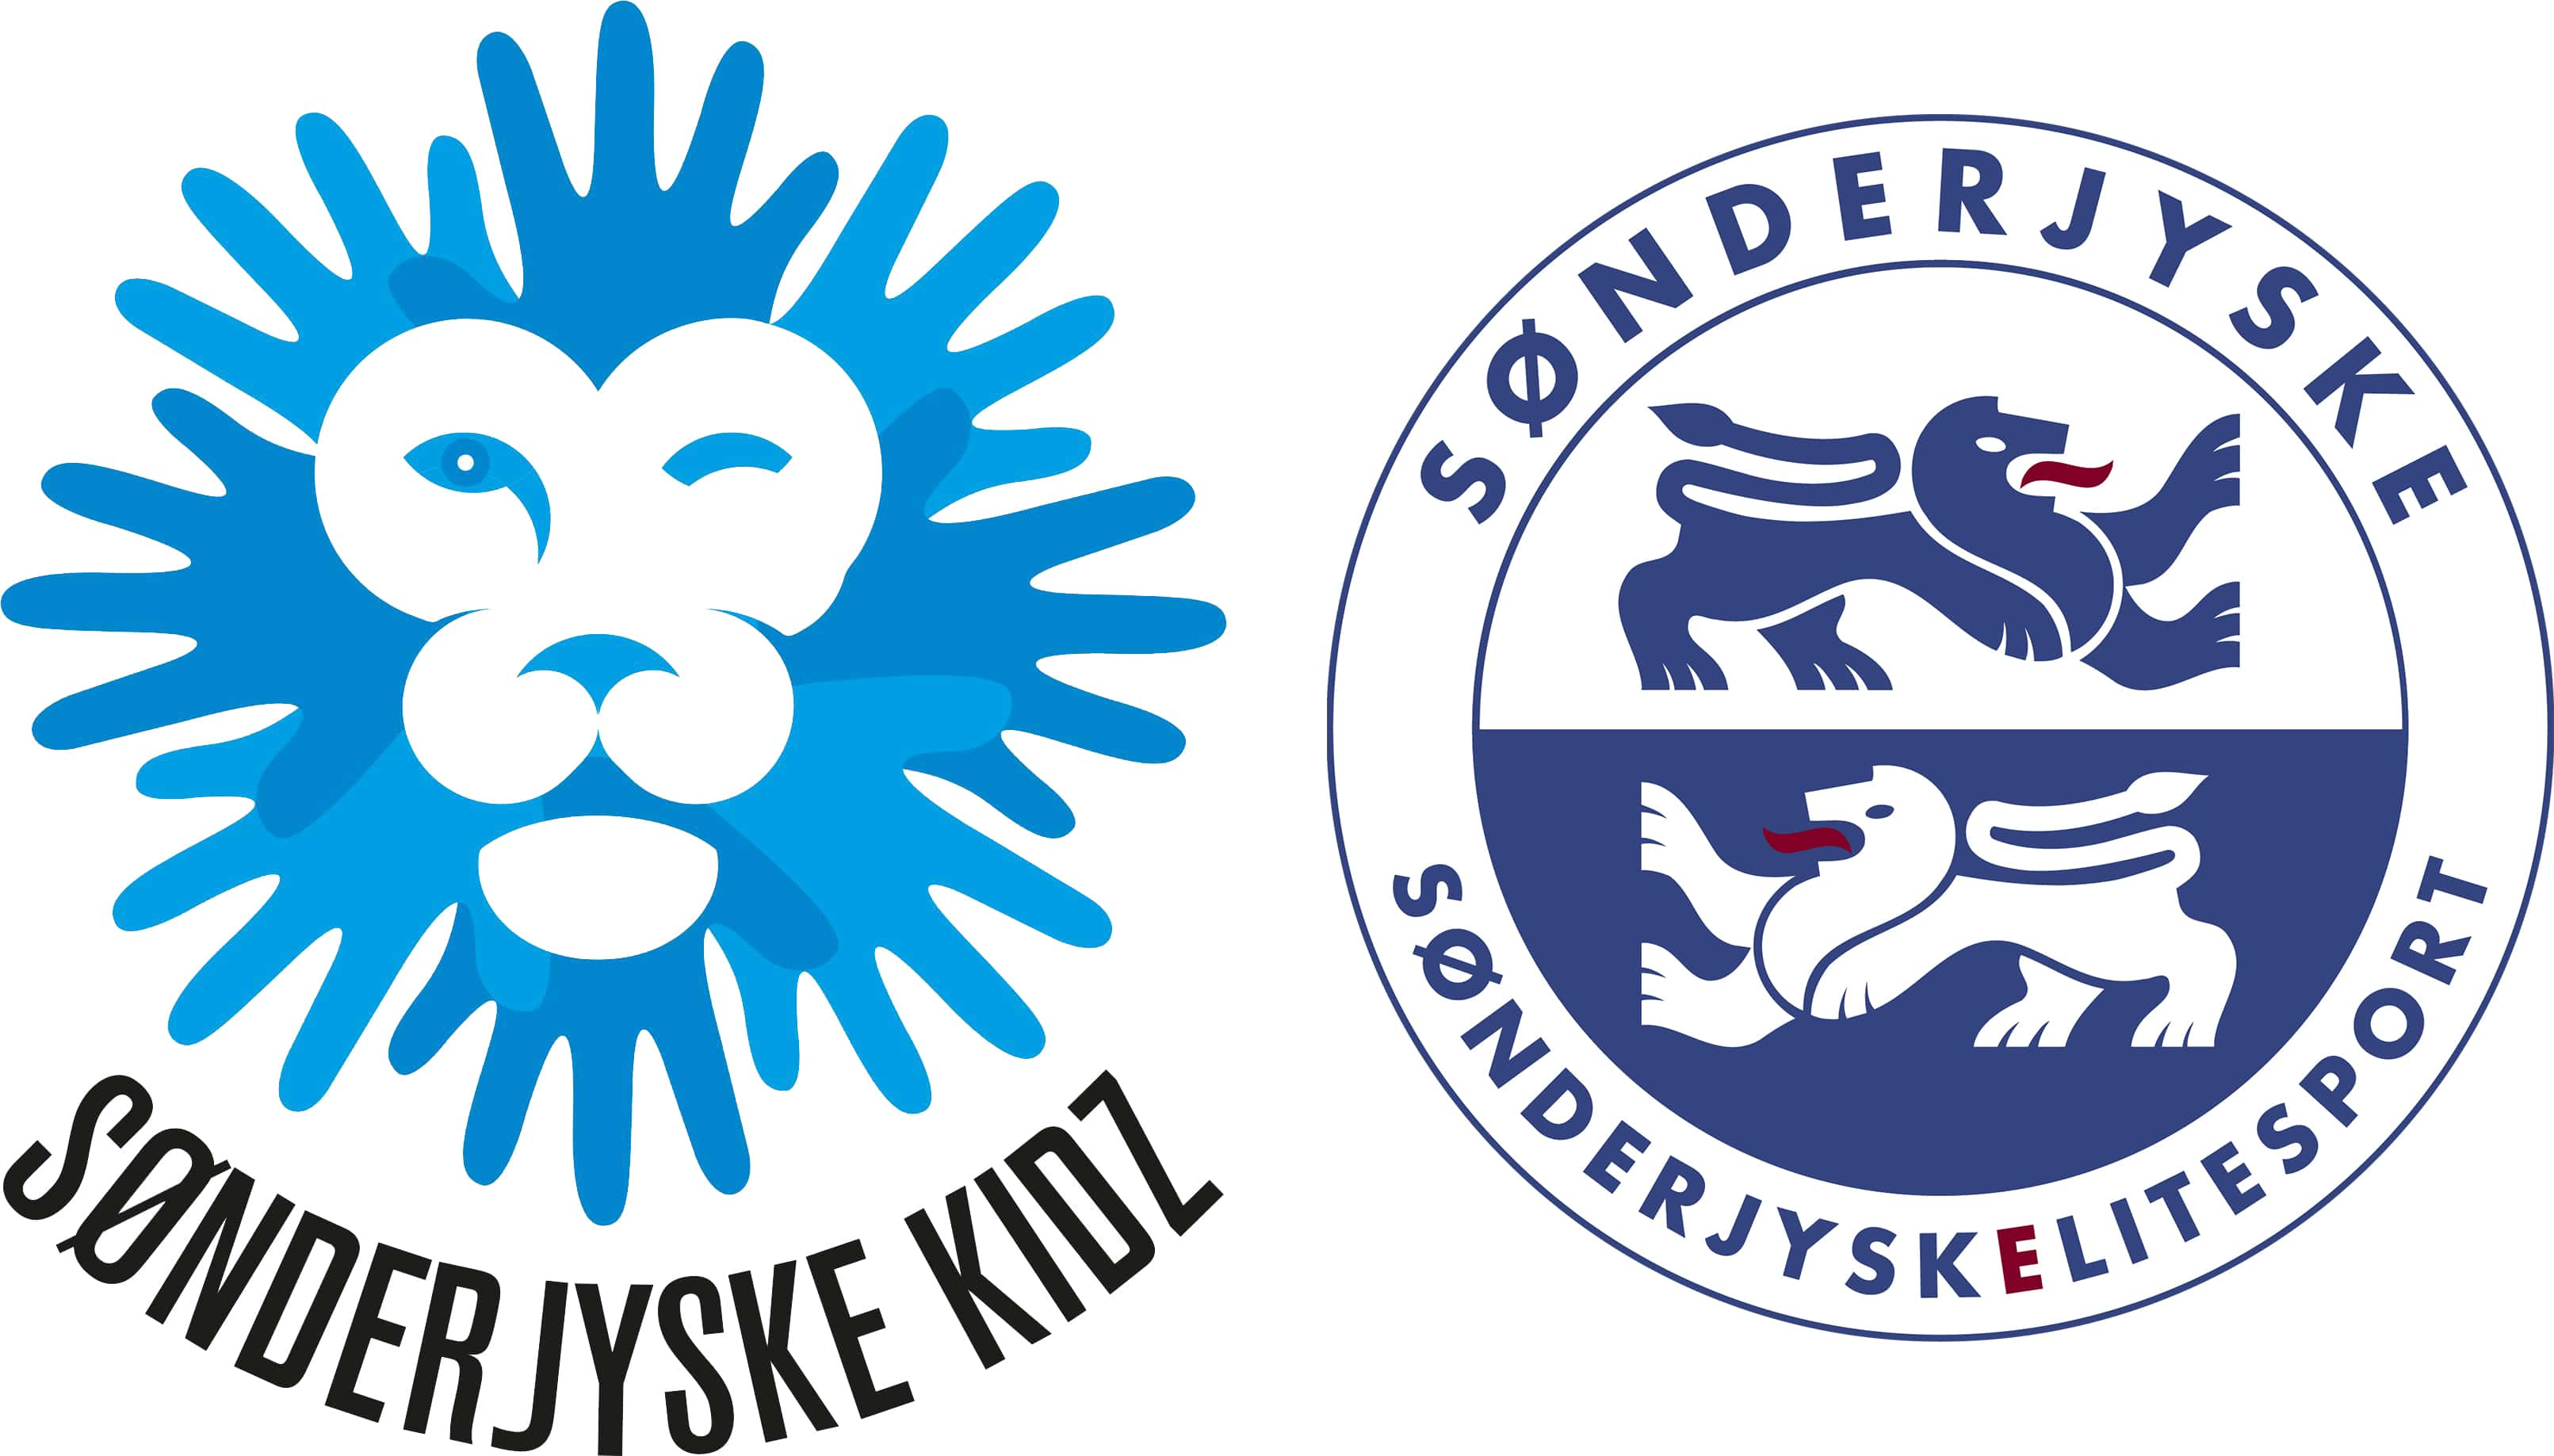 Sønderjyske Kidz